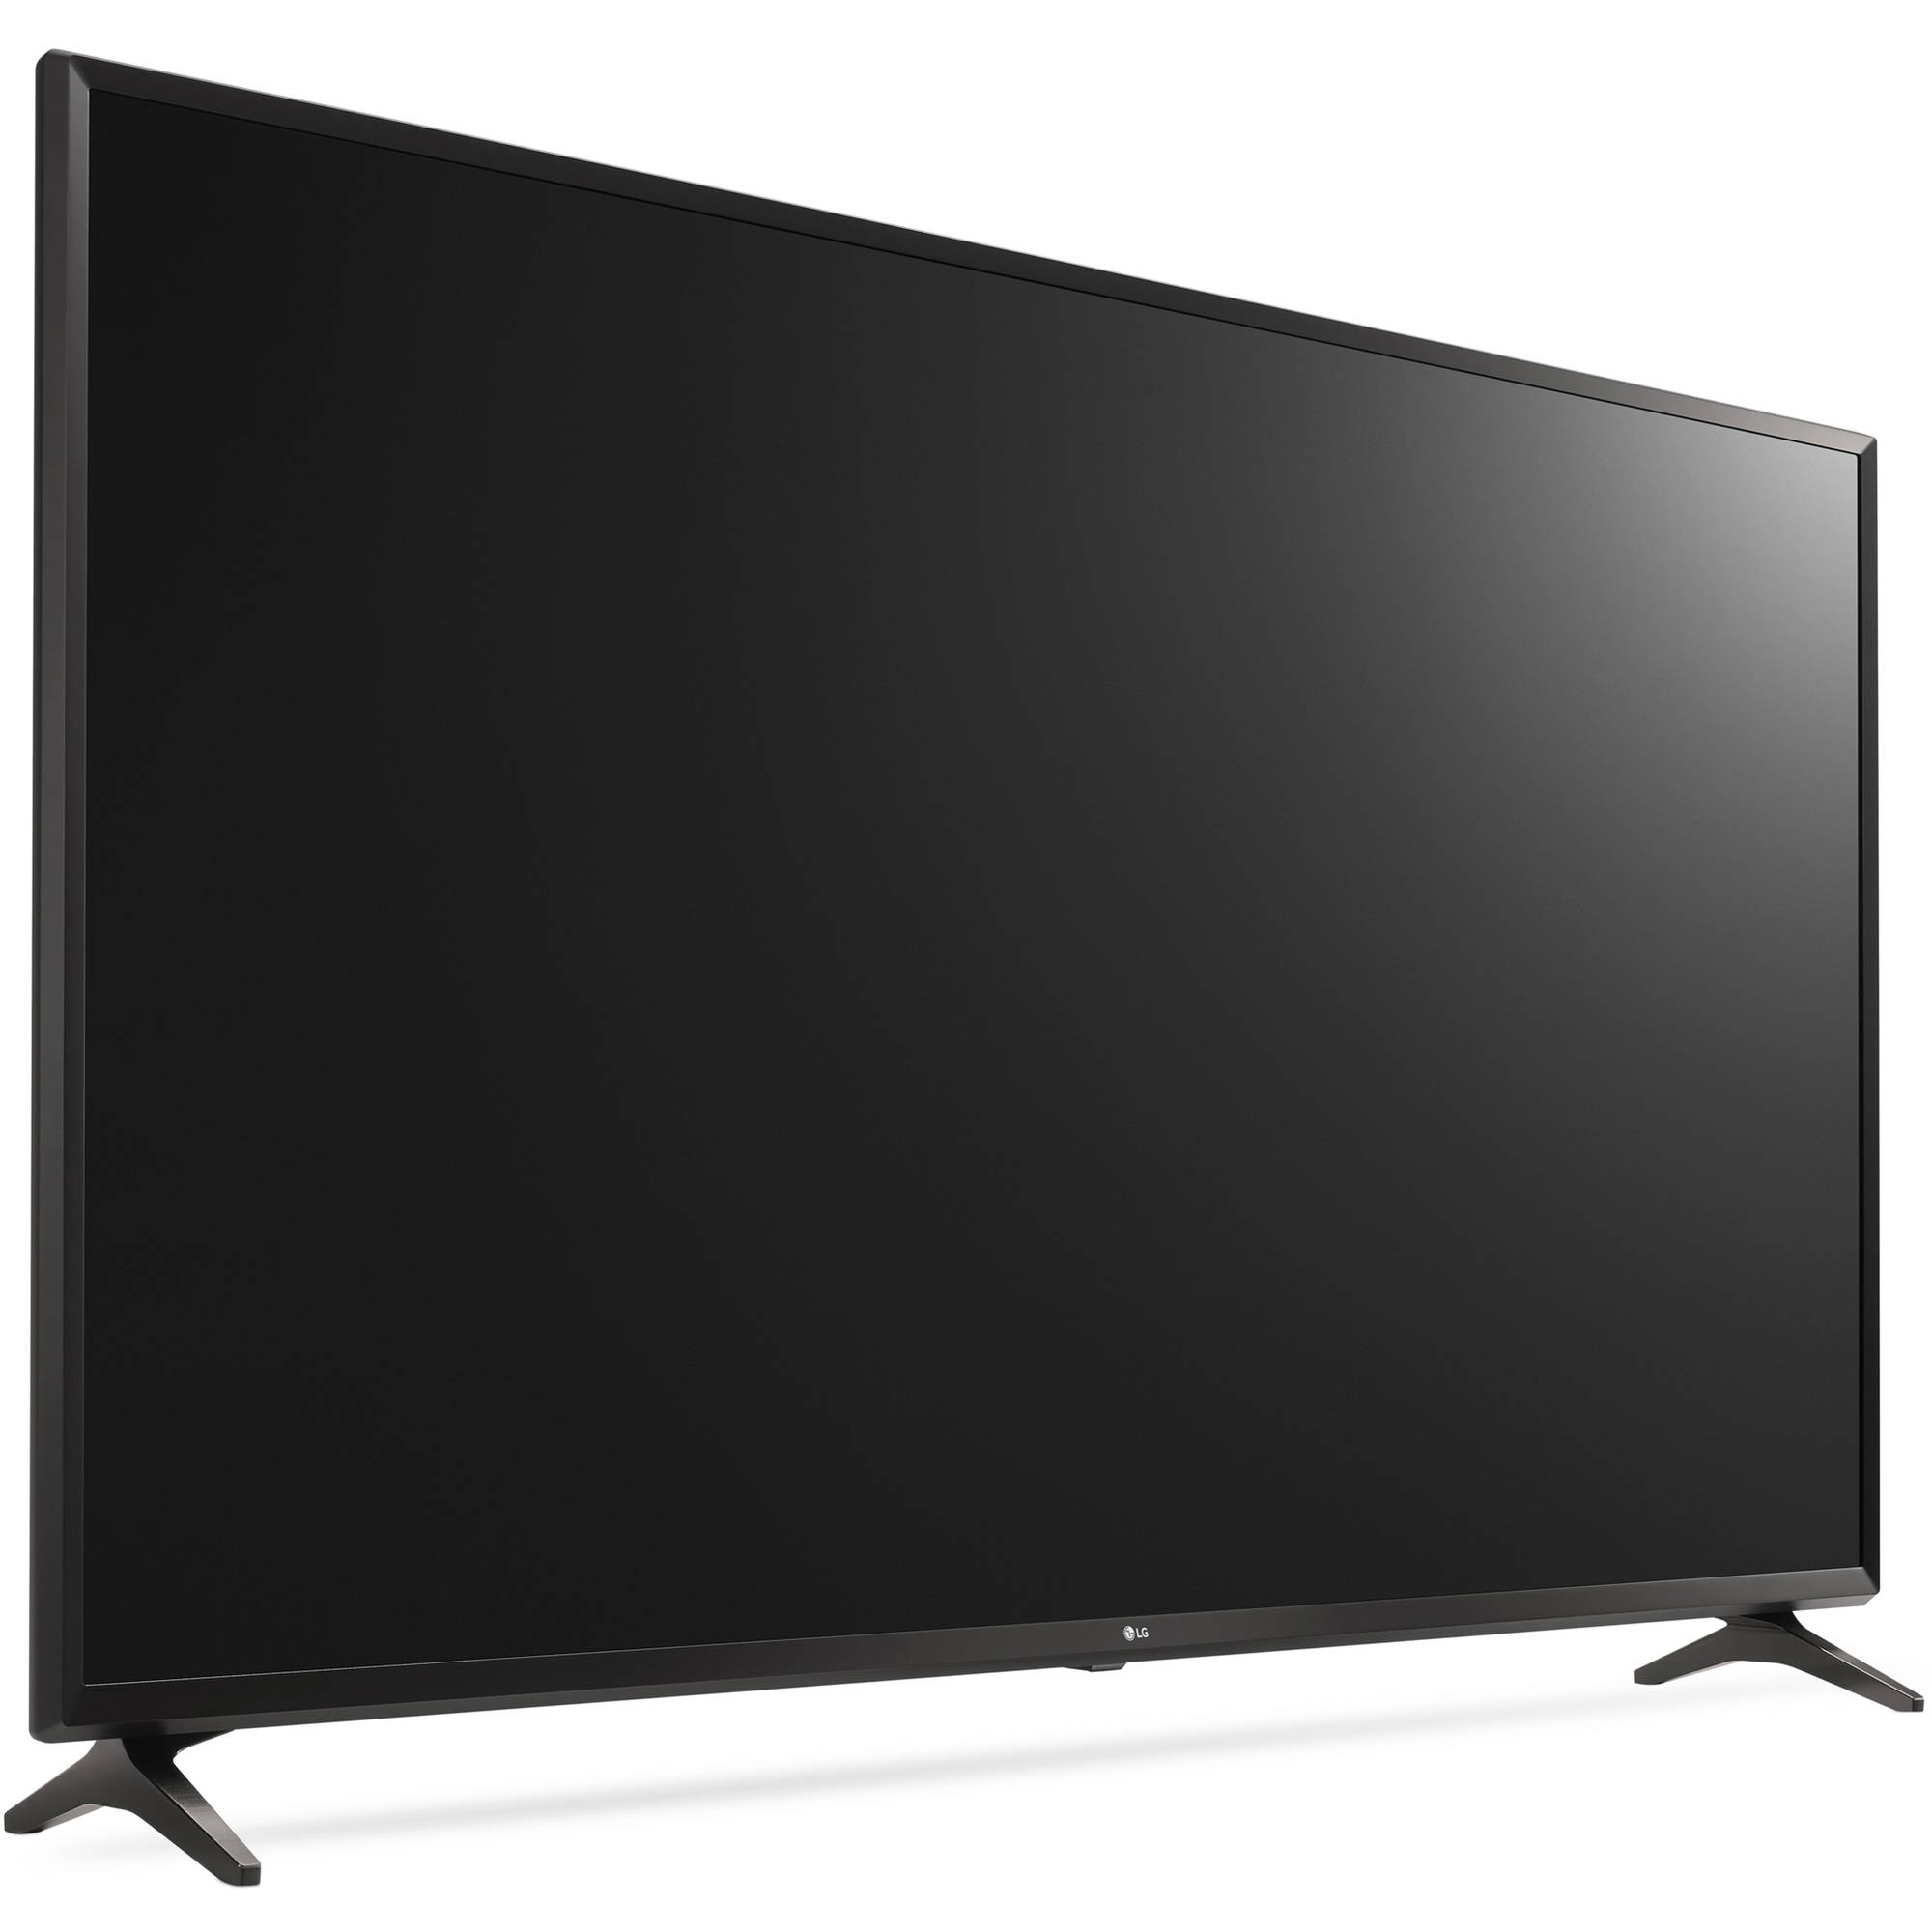 "LG 49"" Class 4K Ultra HD (2160P) Smart LED TV (49UJ6300)"